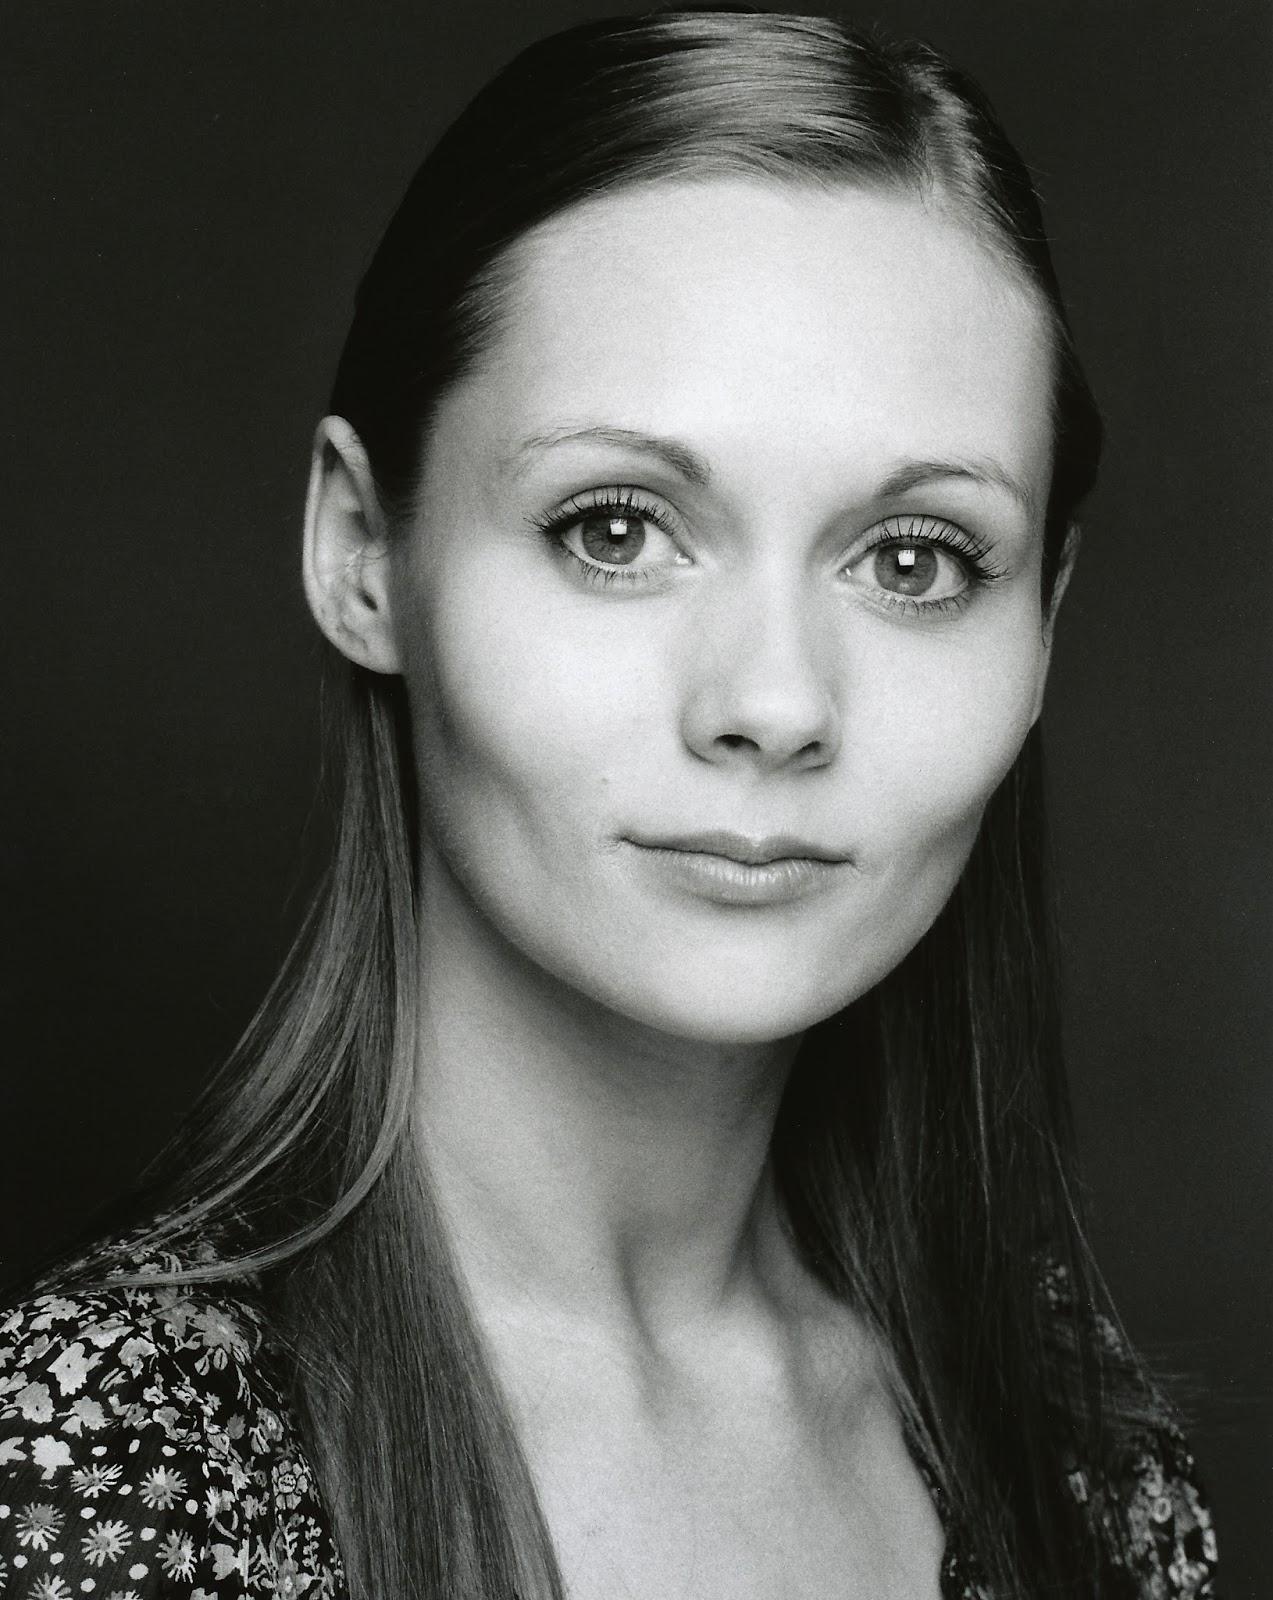 Sophia Hatfield